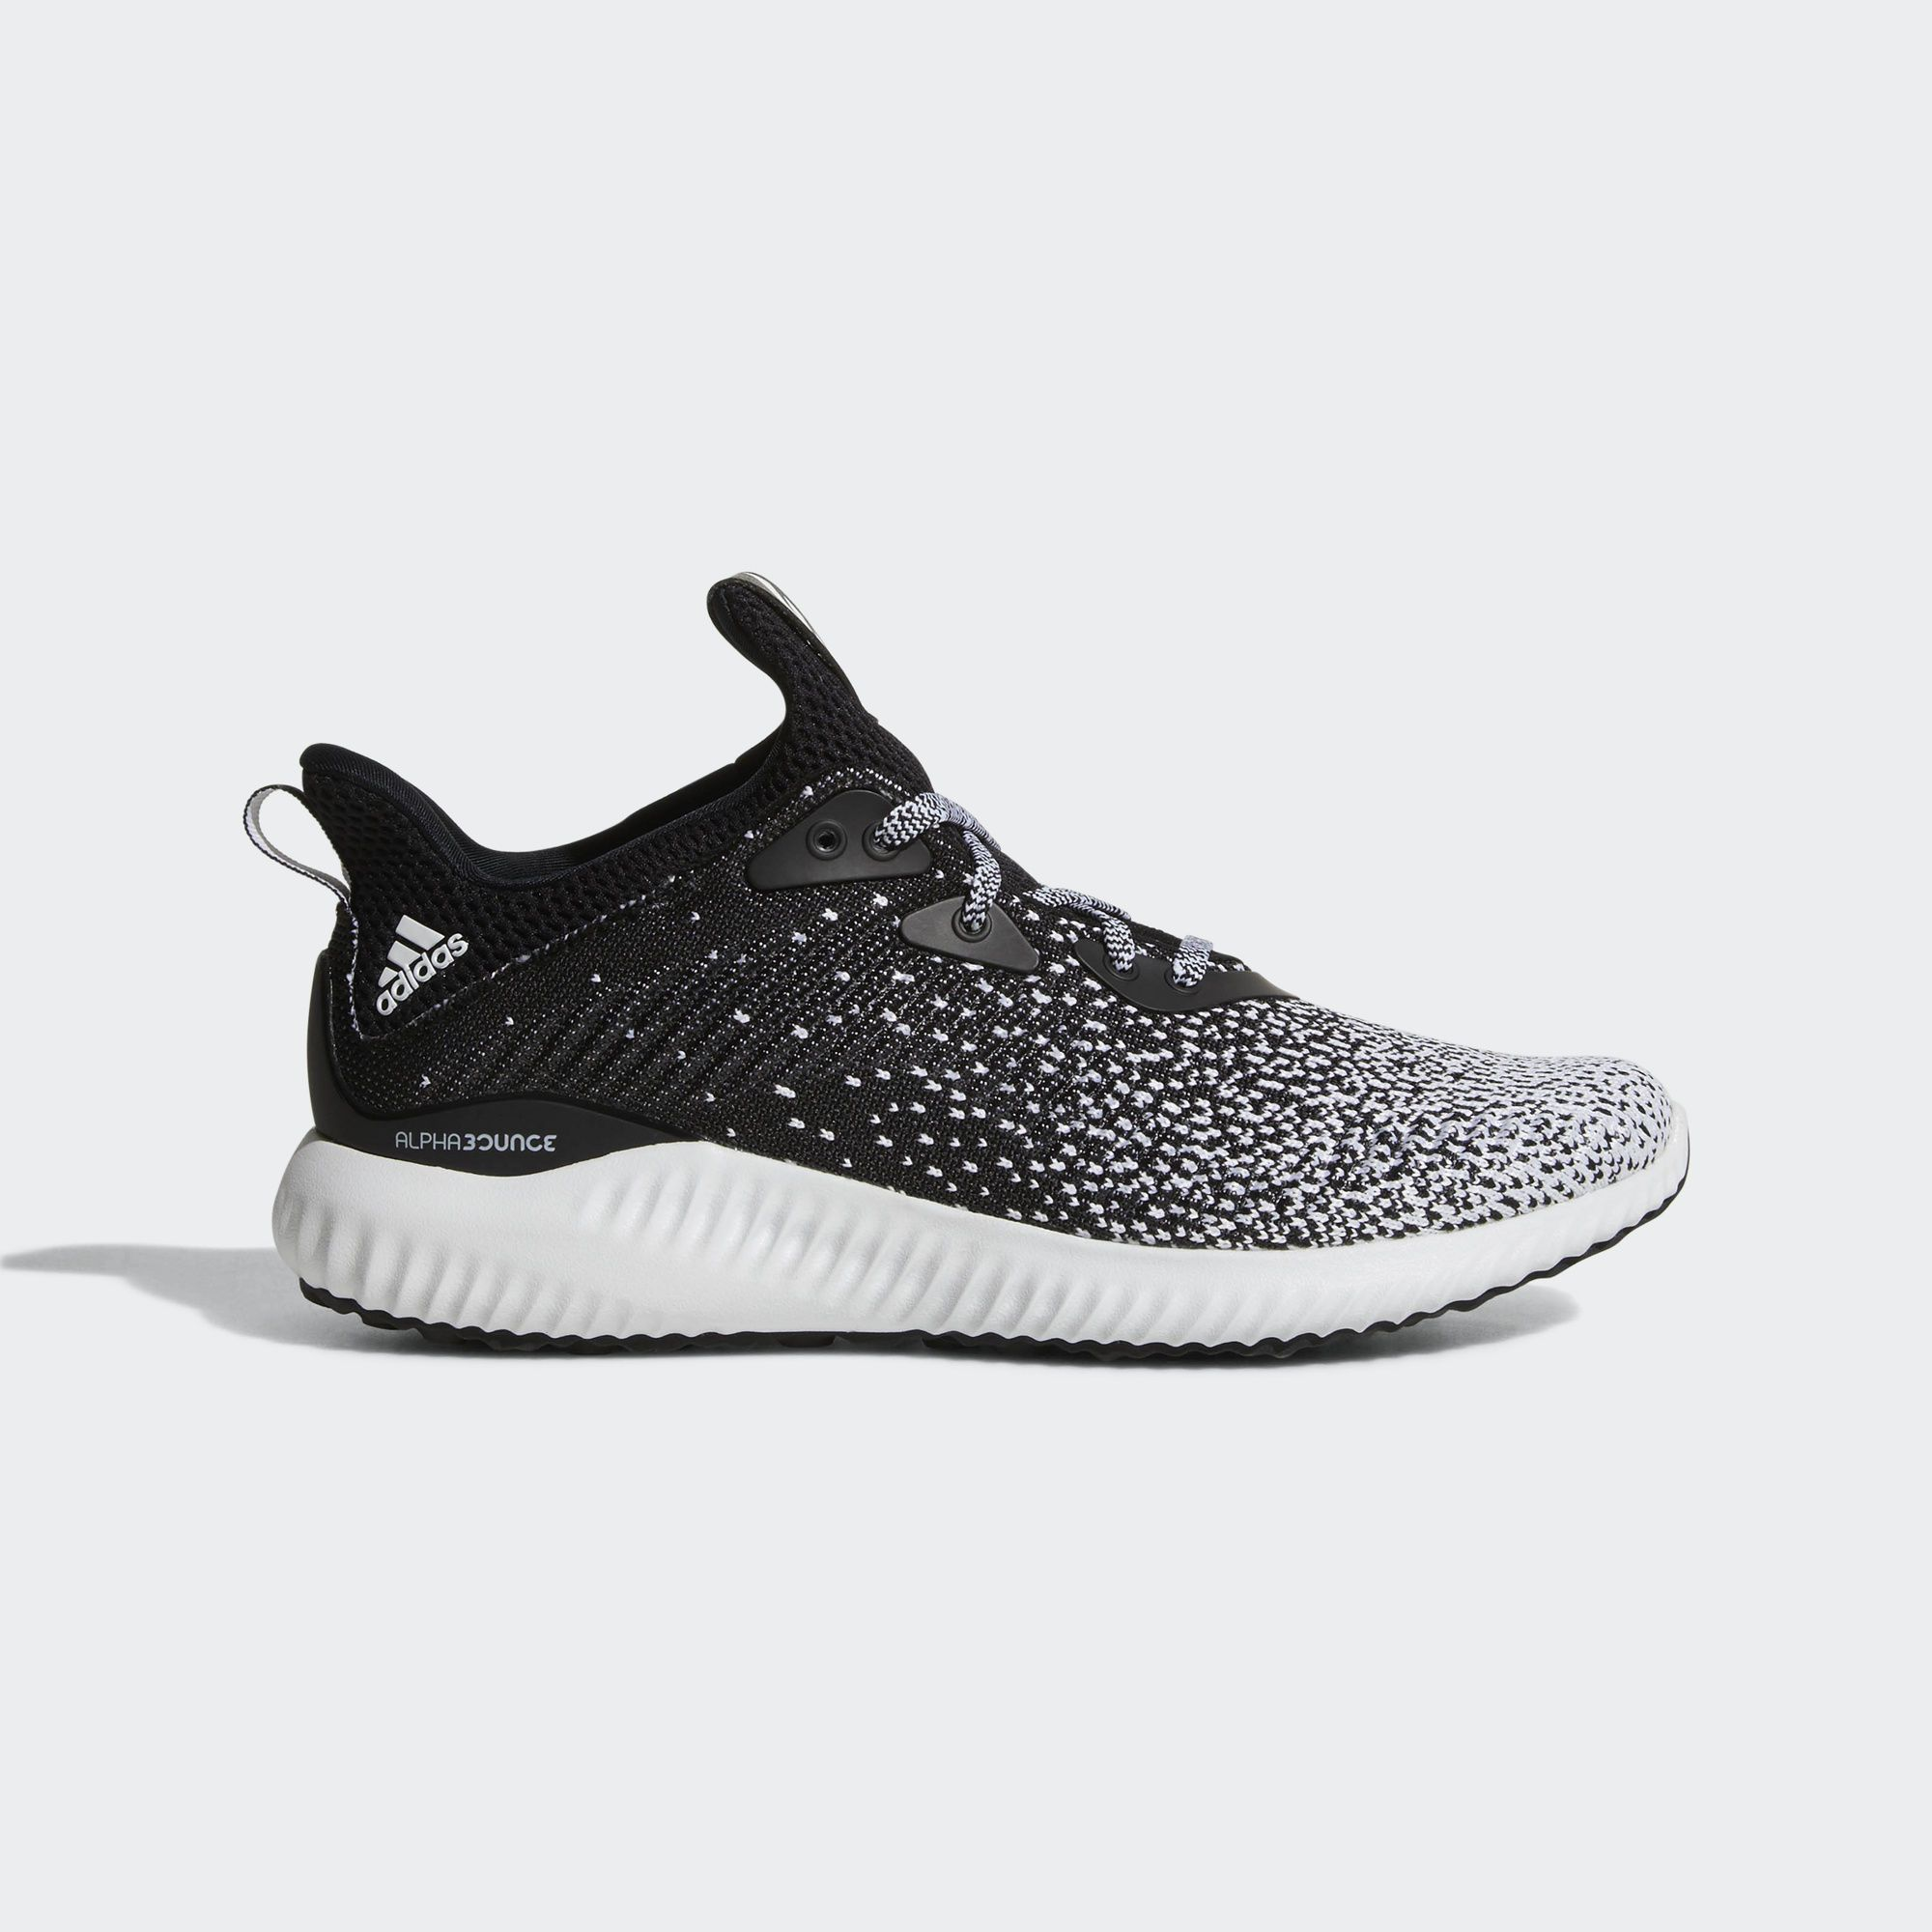 6c01f0e134fd85 adidas Alphabounce CK Shoes - Black